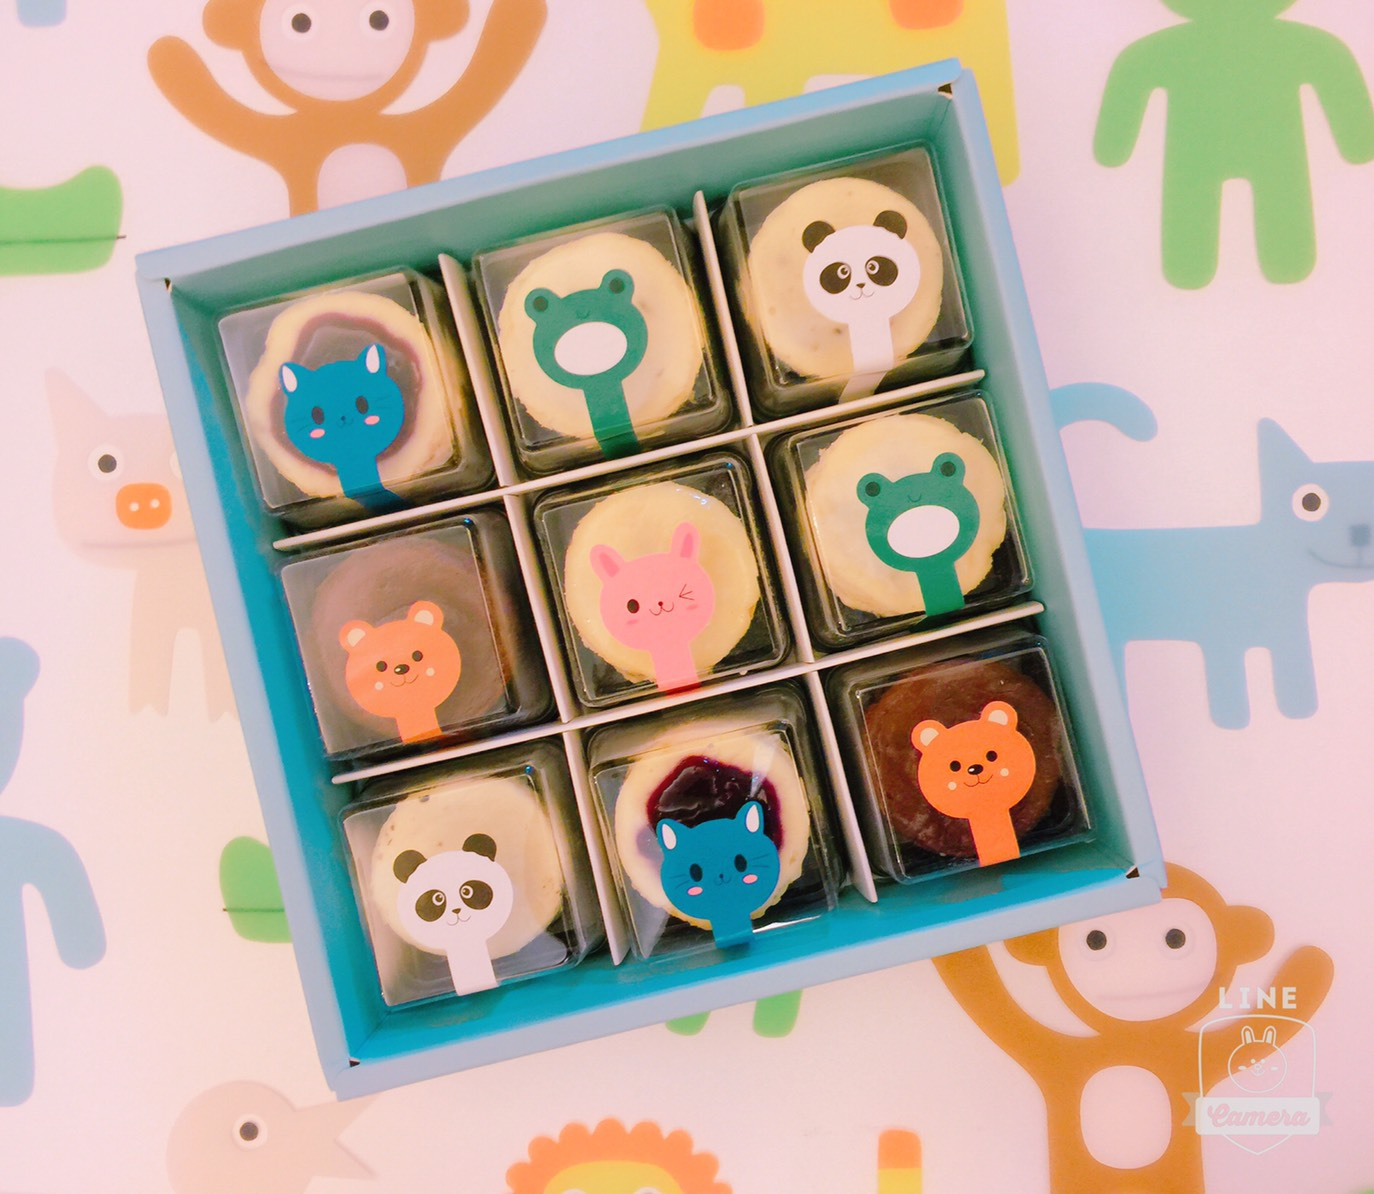 Baby cheesecake 9入禮盒【五種口味,一次滿足】